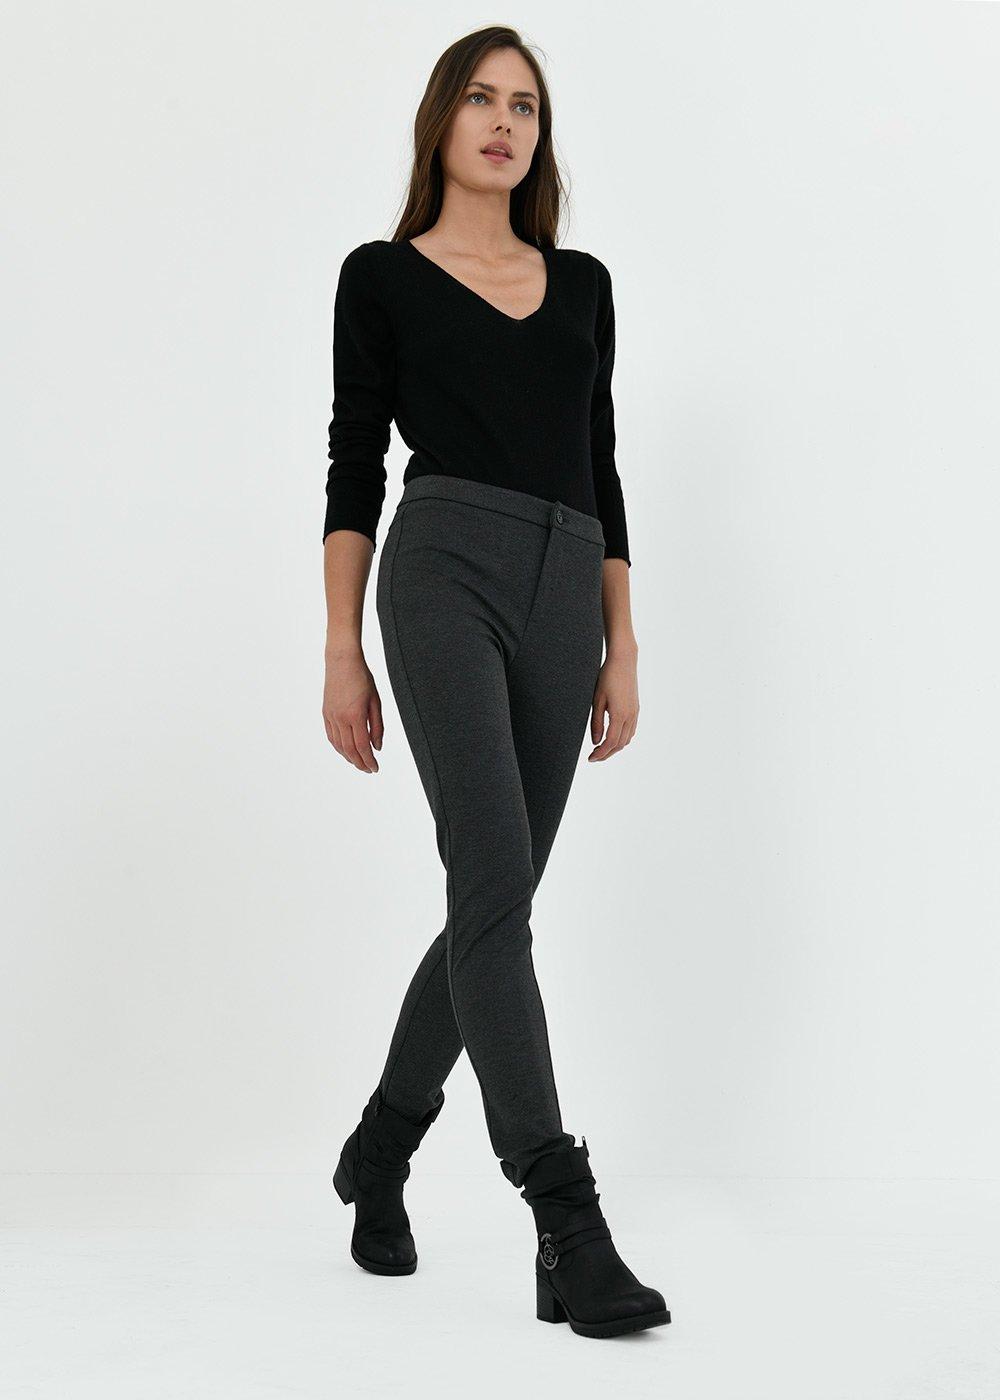 Pantalone Kellysche in punto milano - Grey Melange - Donna